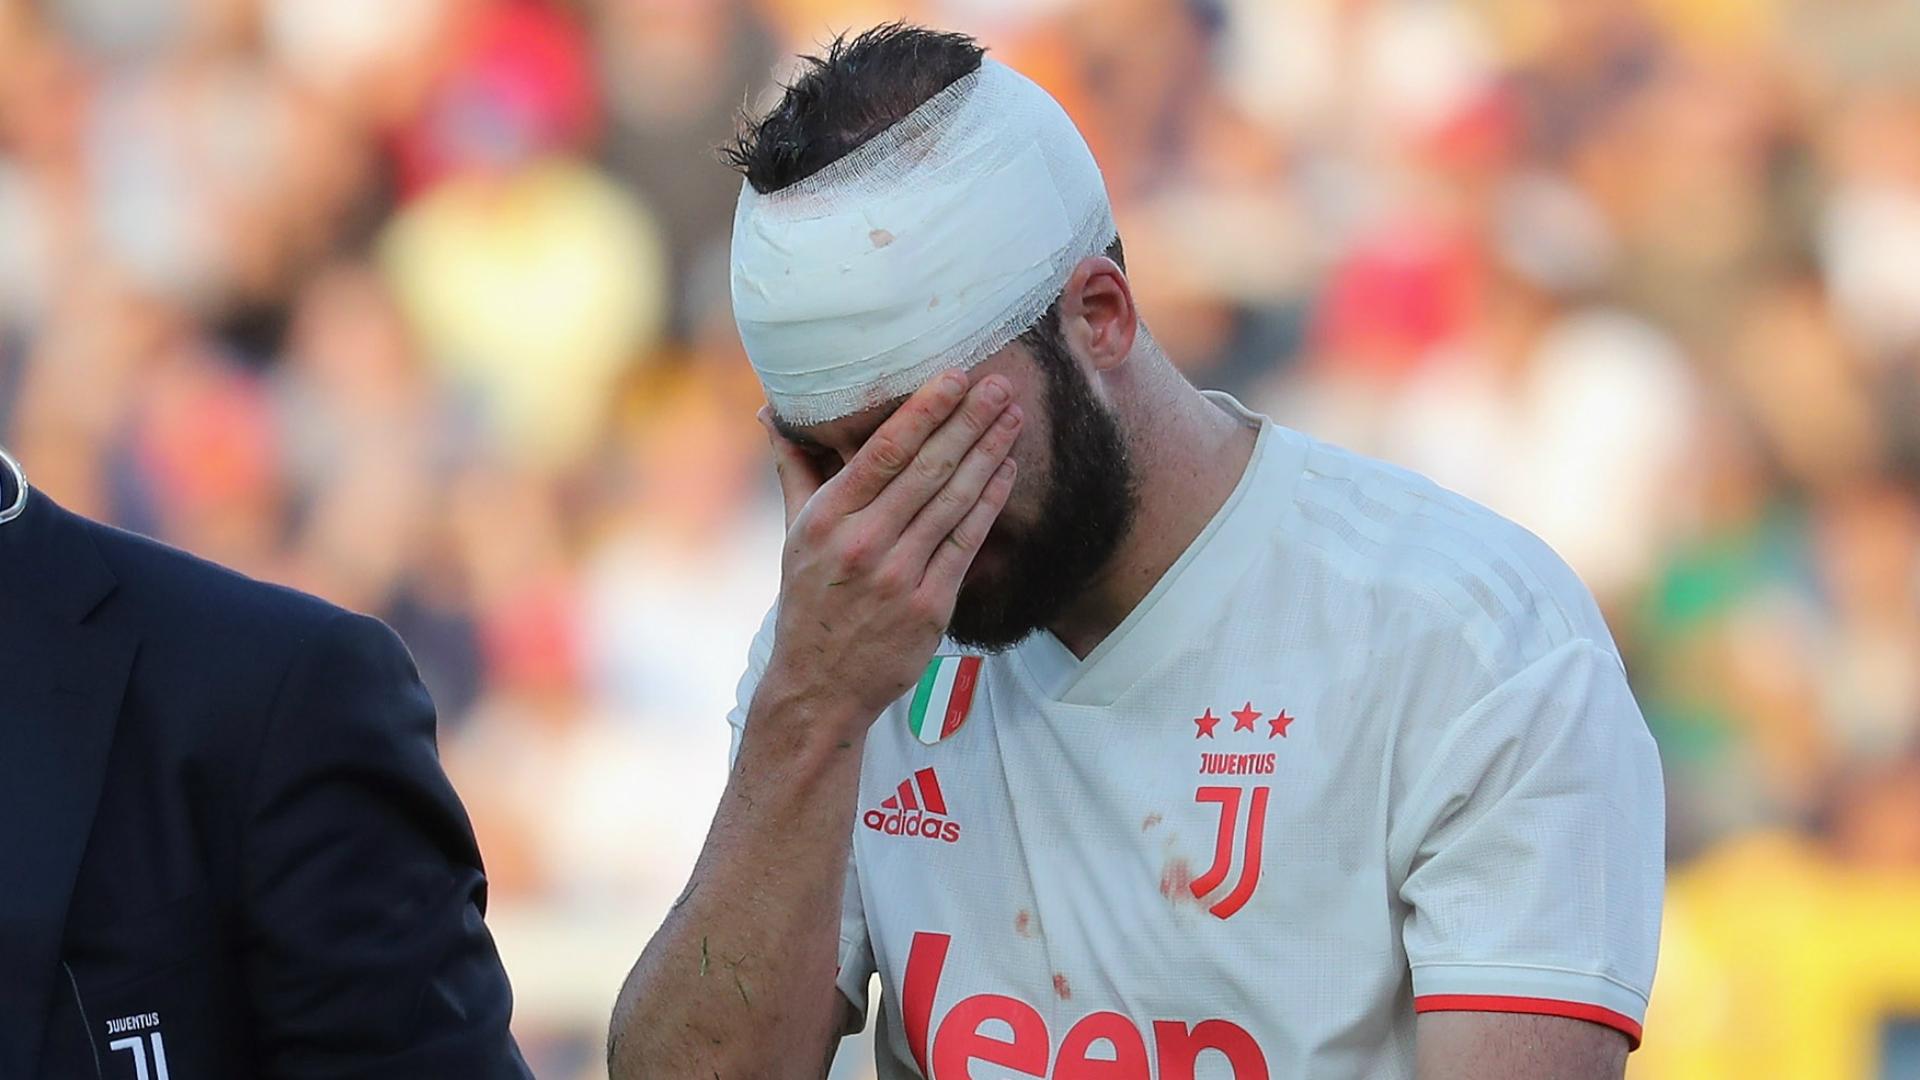 Juventus striker Higuain returns to training ahead of Torino clash